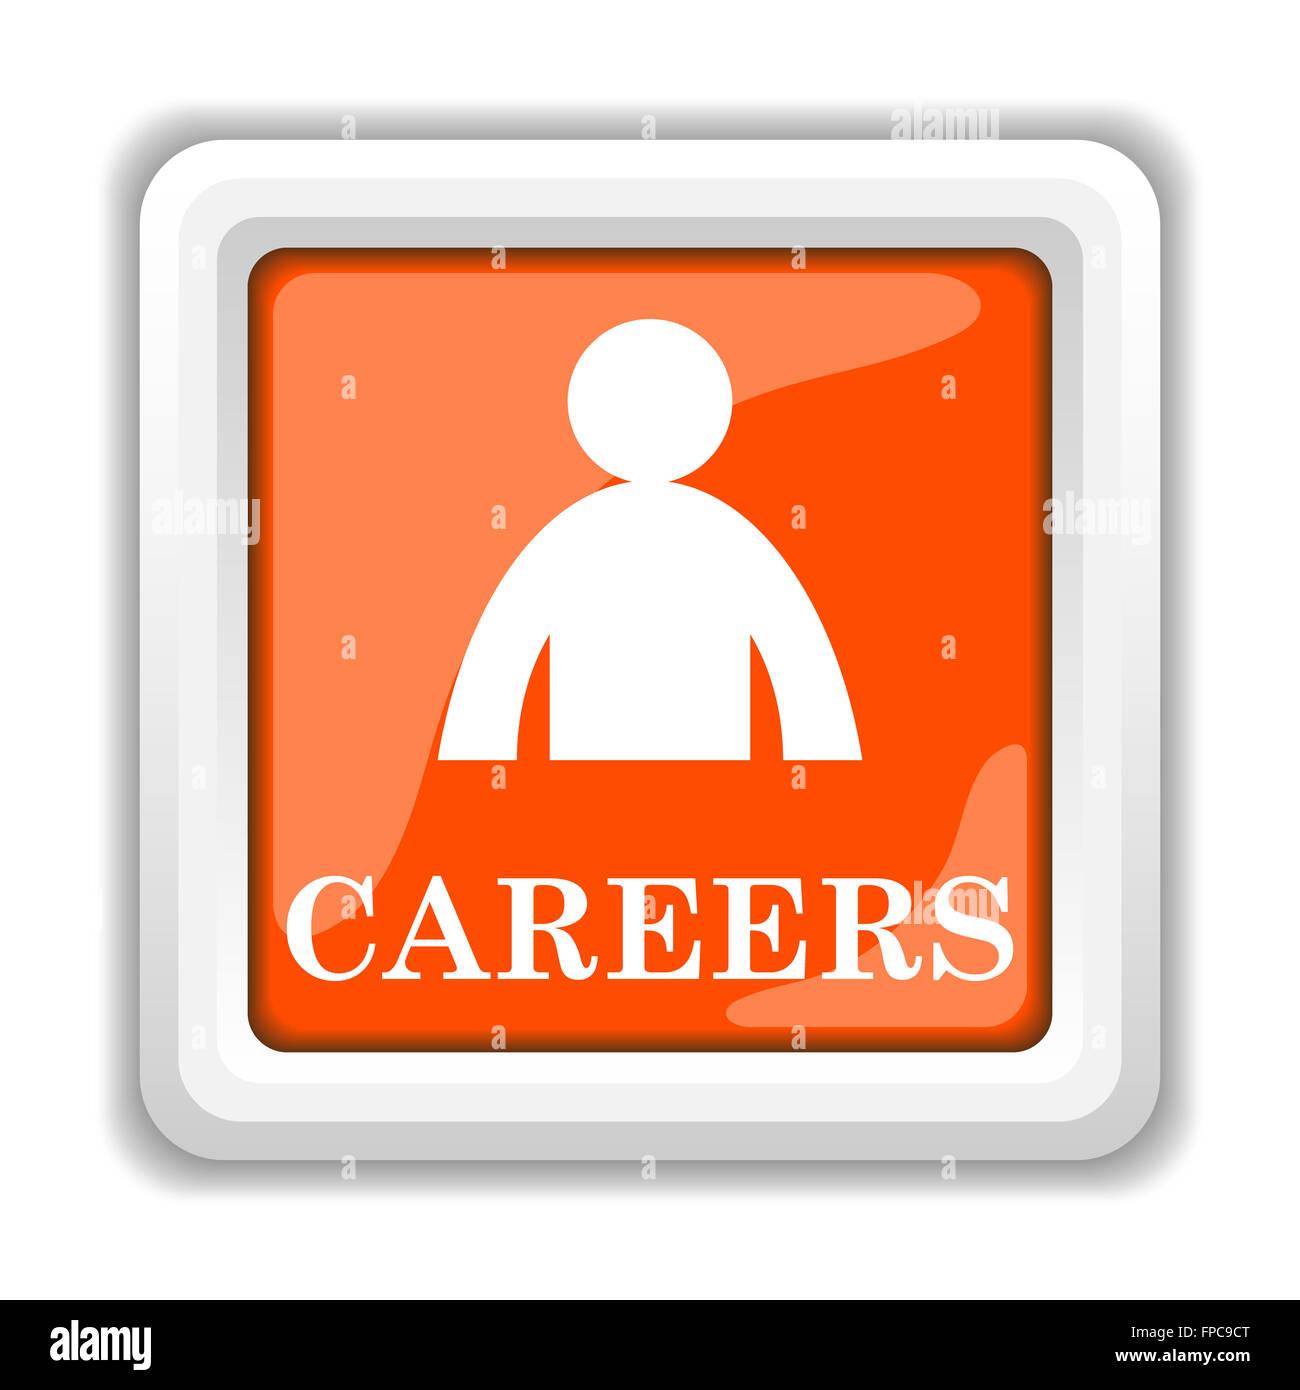 Careers icon - Stock Image